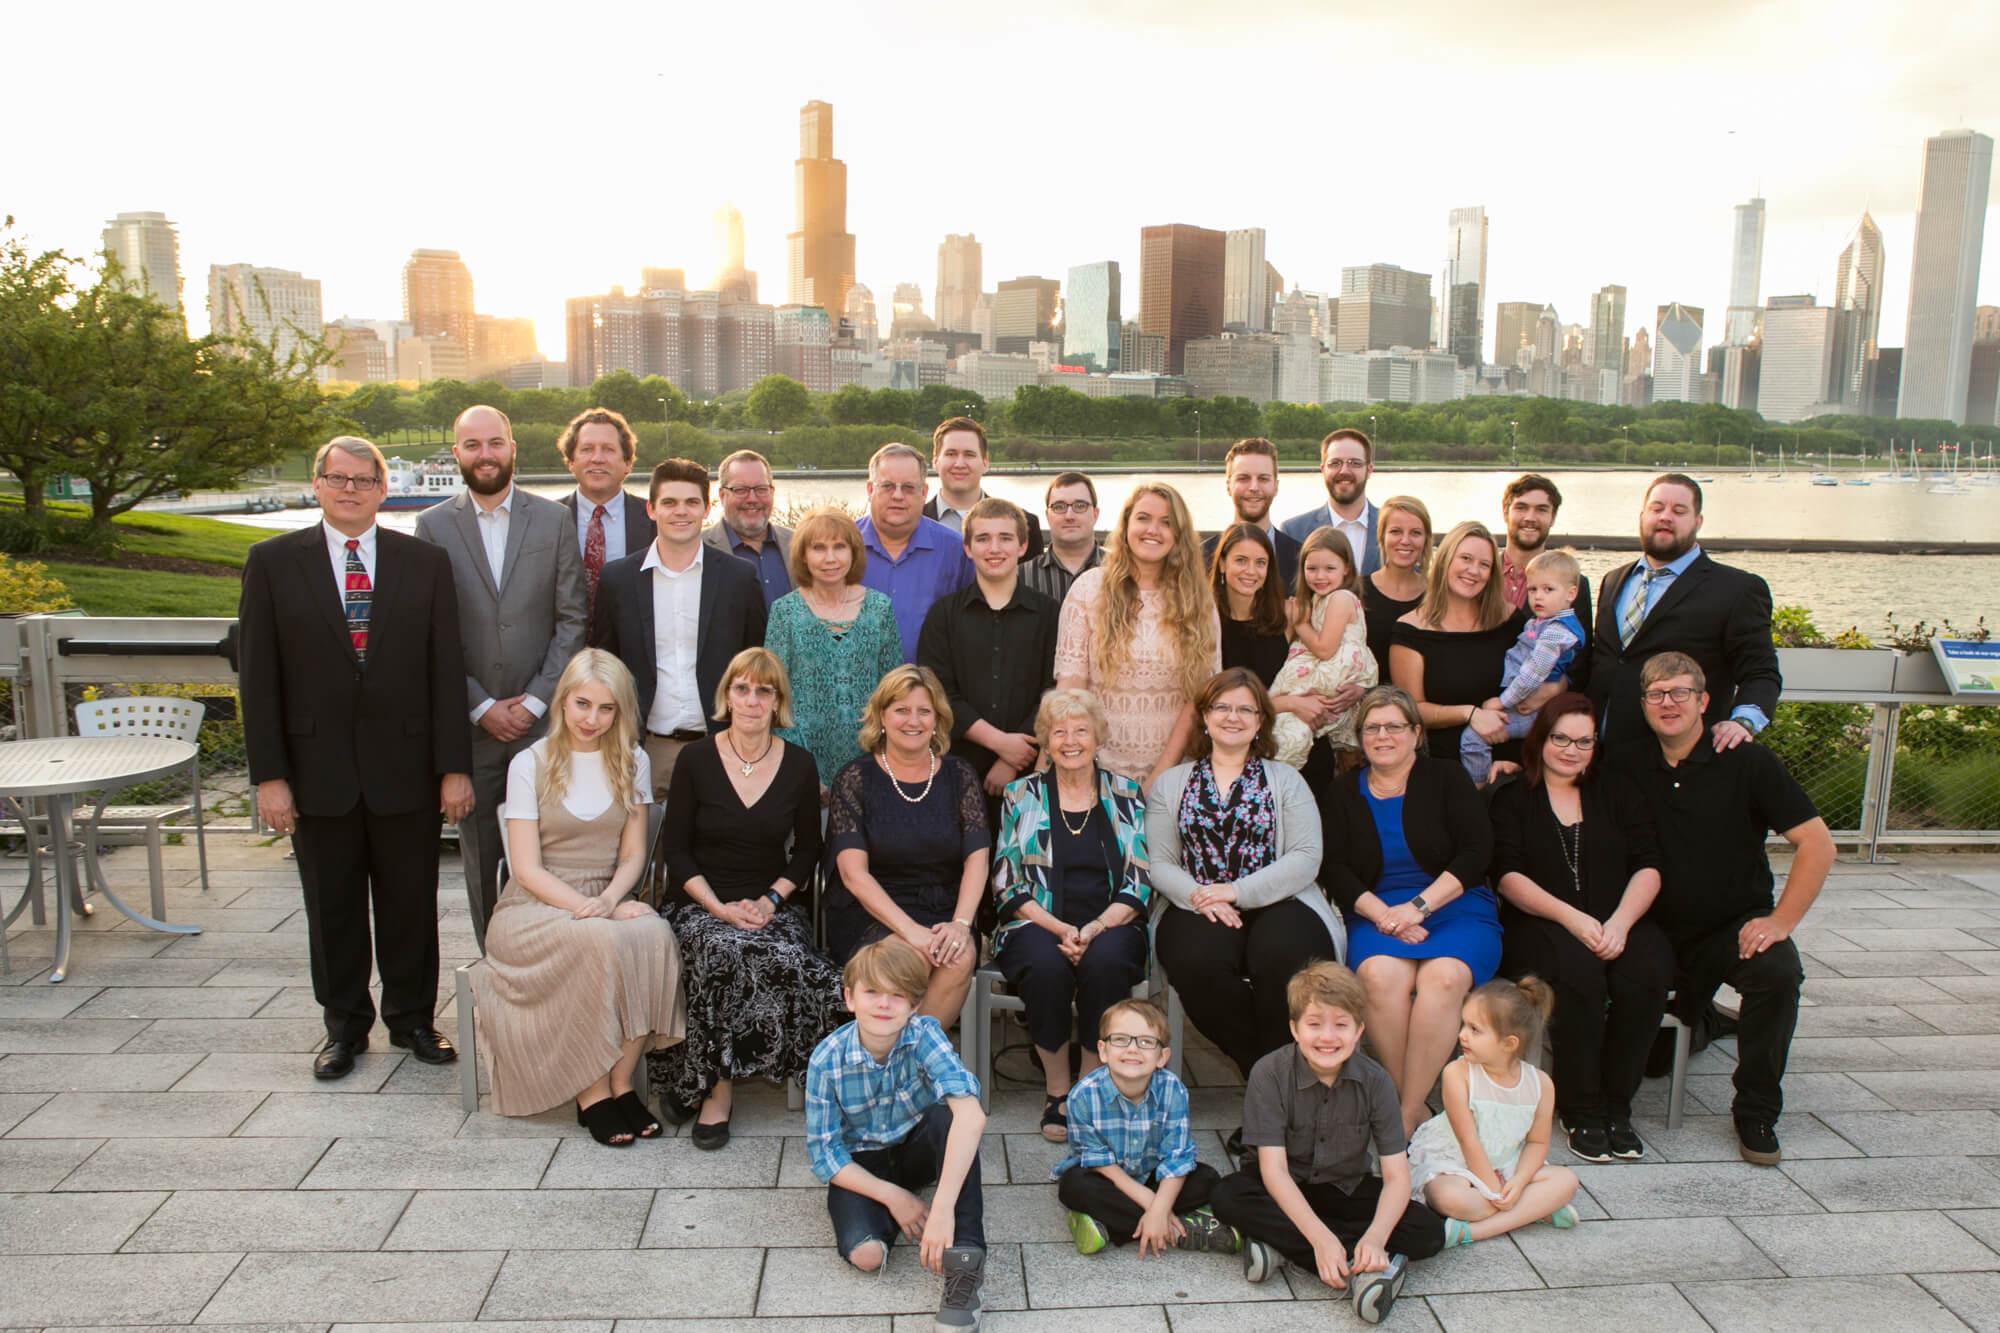 Large Family portrait at Shedd Aquarium Chicago